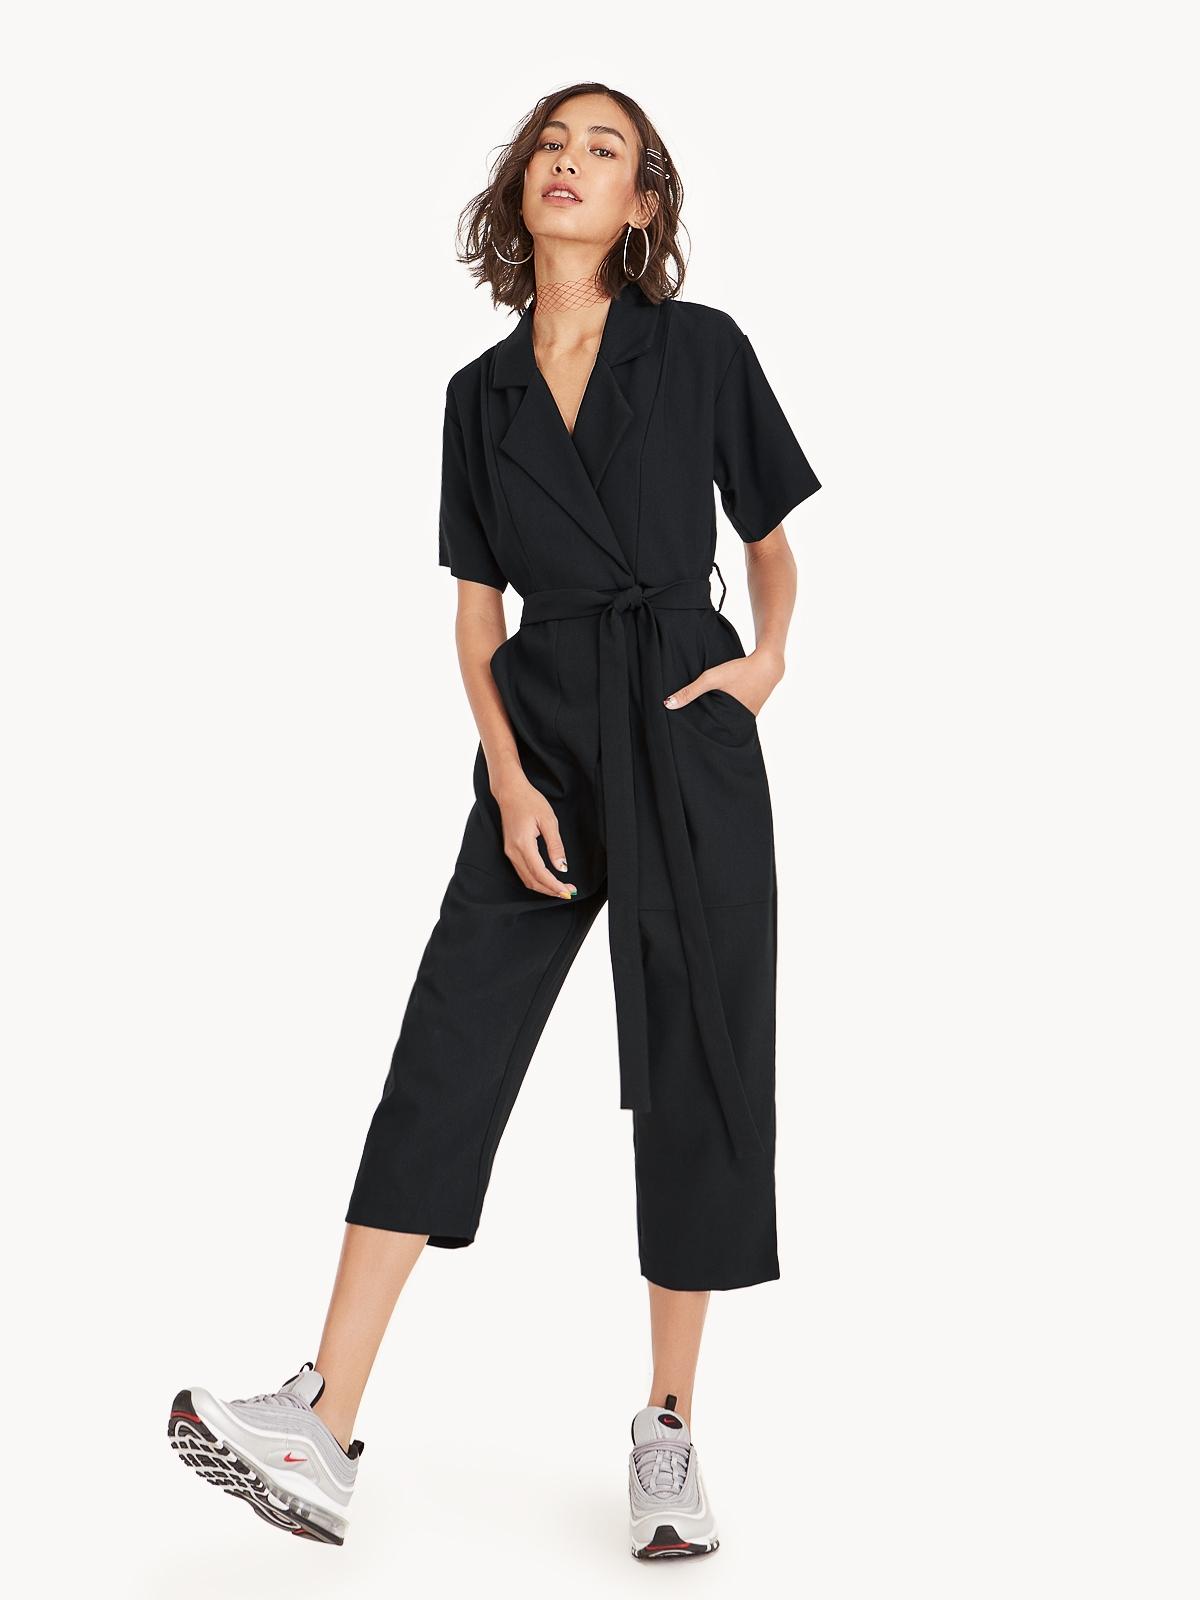 0c790a8a2746 Arden Short Sleeve Jumpsuit - Black - Pomelo Thailand